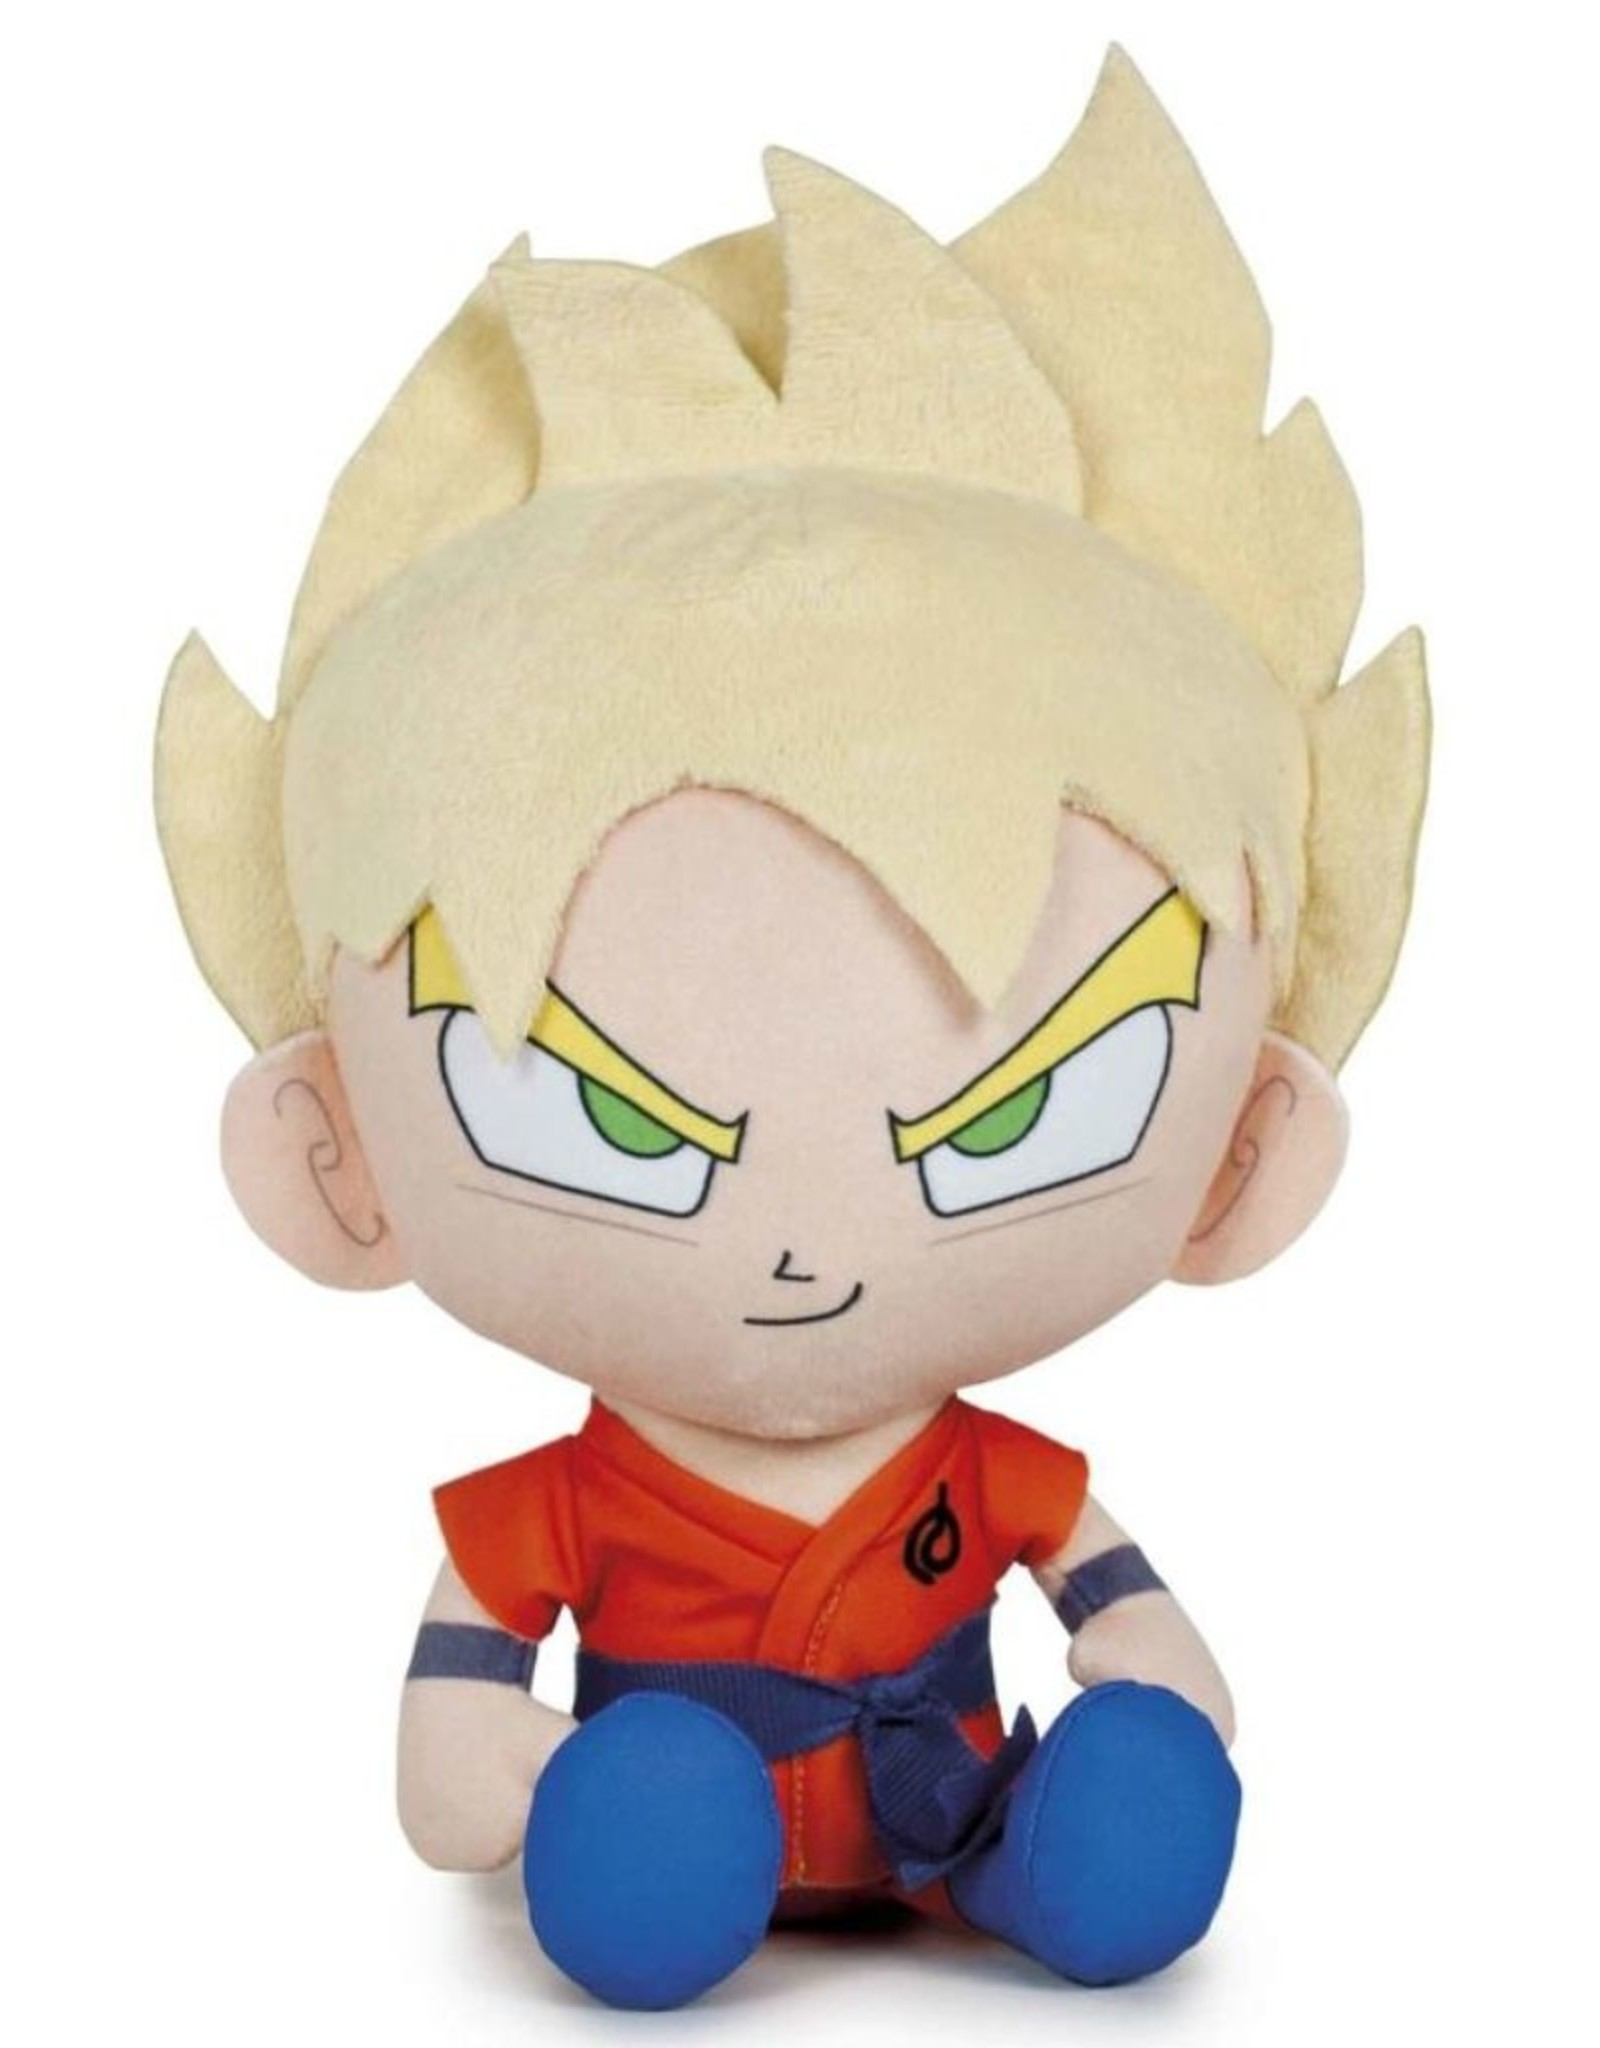 Dragon Ball Merchandise plush and figurines - Dragon Ball Super Goku plush toy 24cm